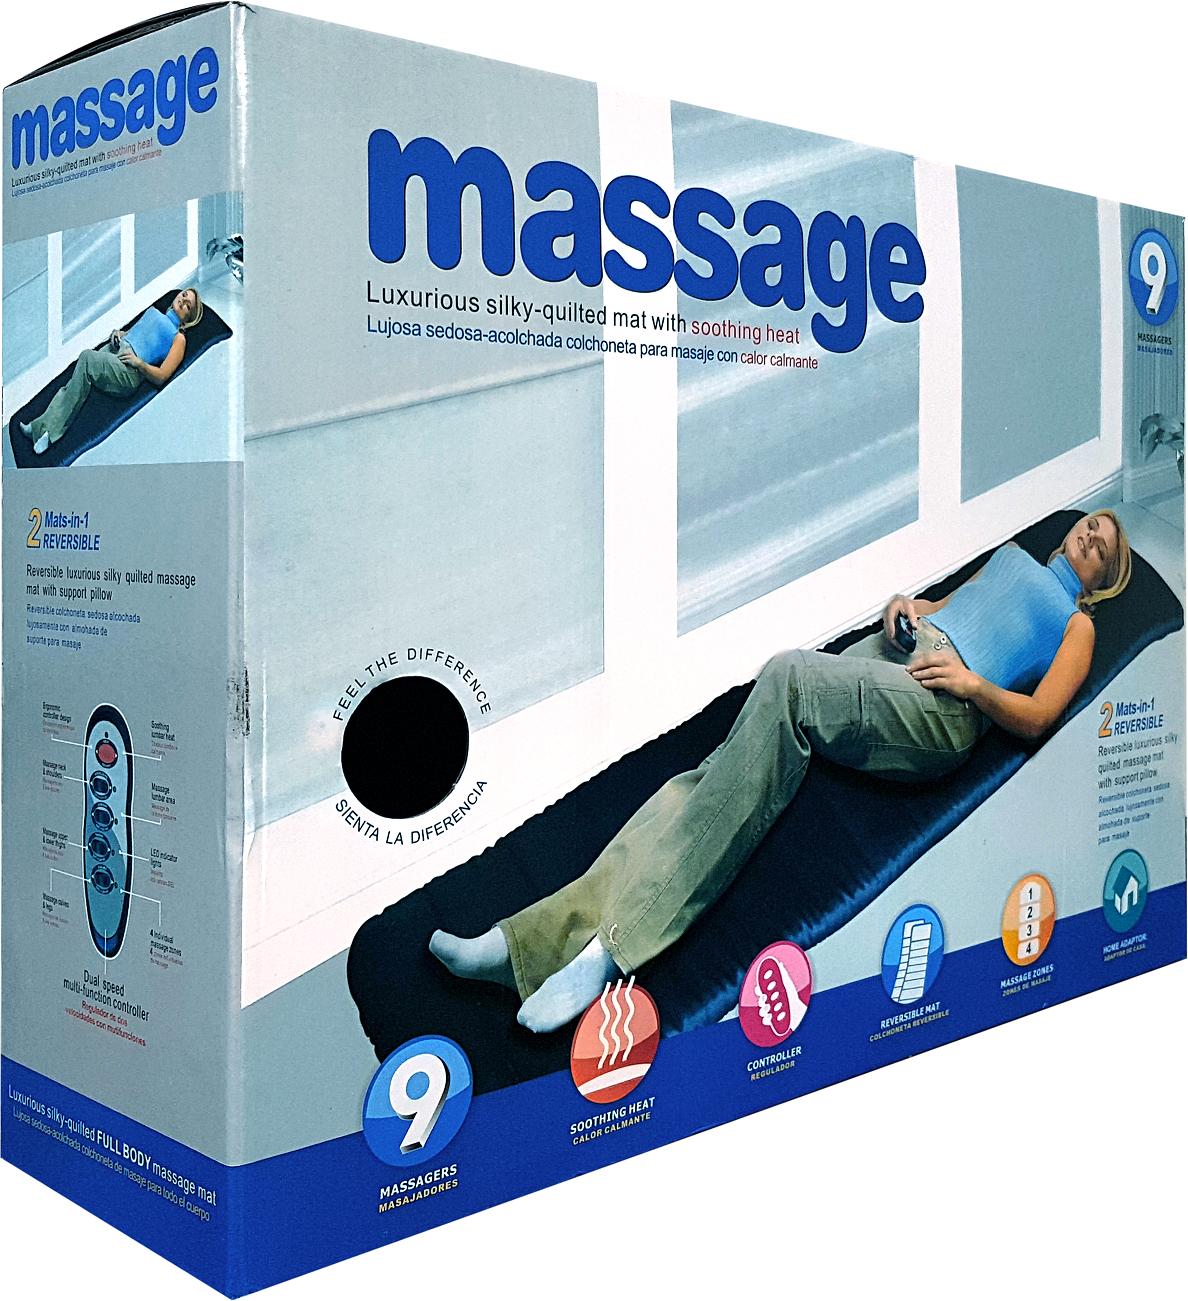 Full Body Vibrating Massage Mattress With Soothing Heat Massage Neck Shoulders Massage Upper Lower Back Dual Speed Shoulder Massage Neck Massage Massage